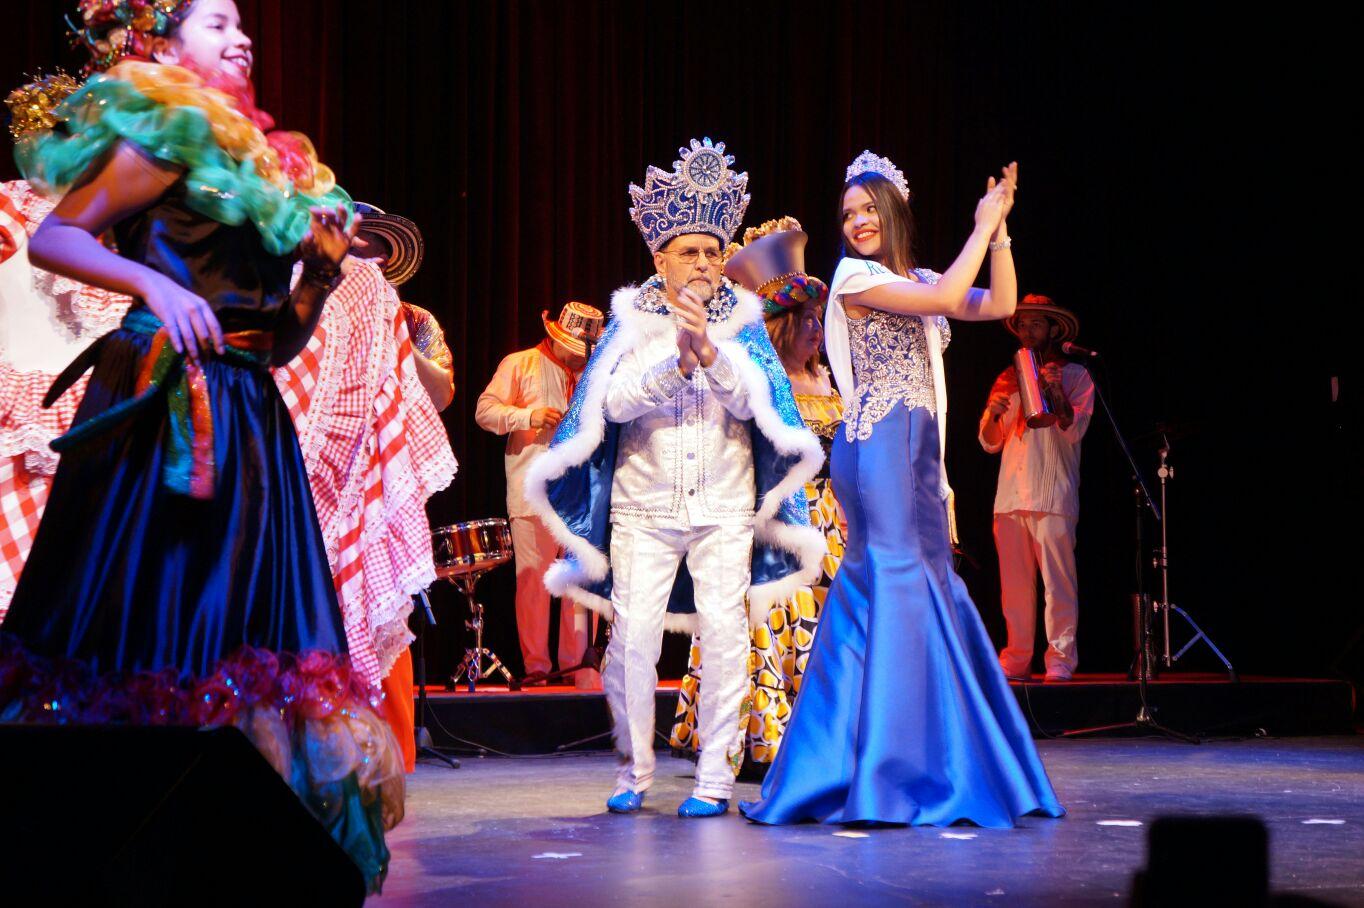 PlayTime Carnaval de Barranquilla